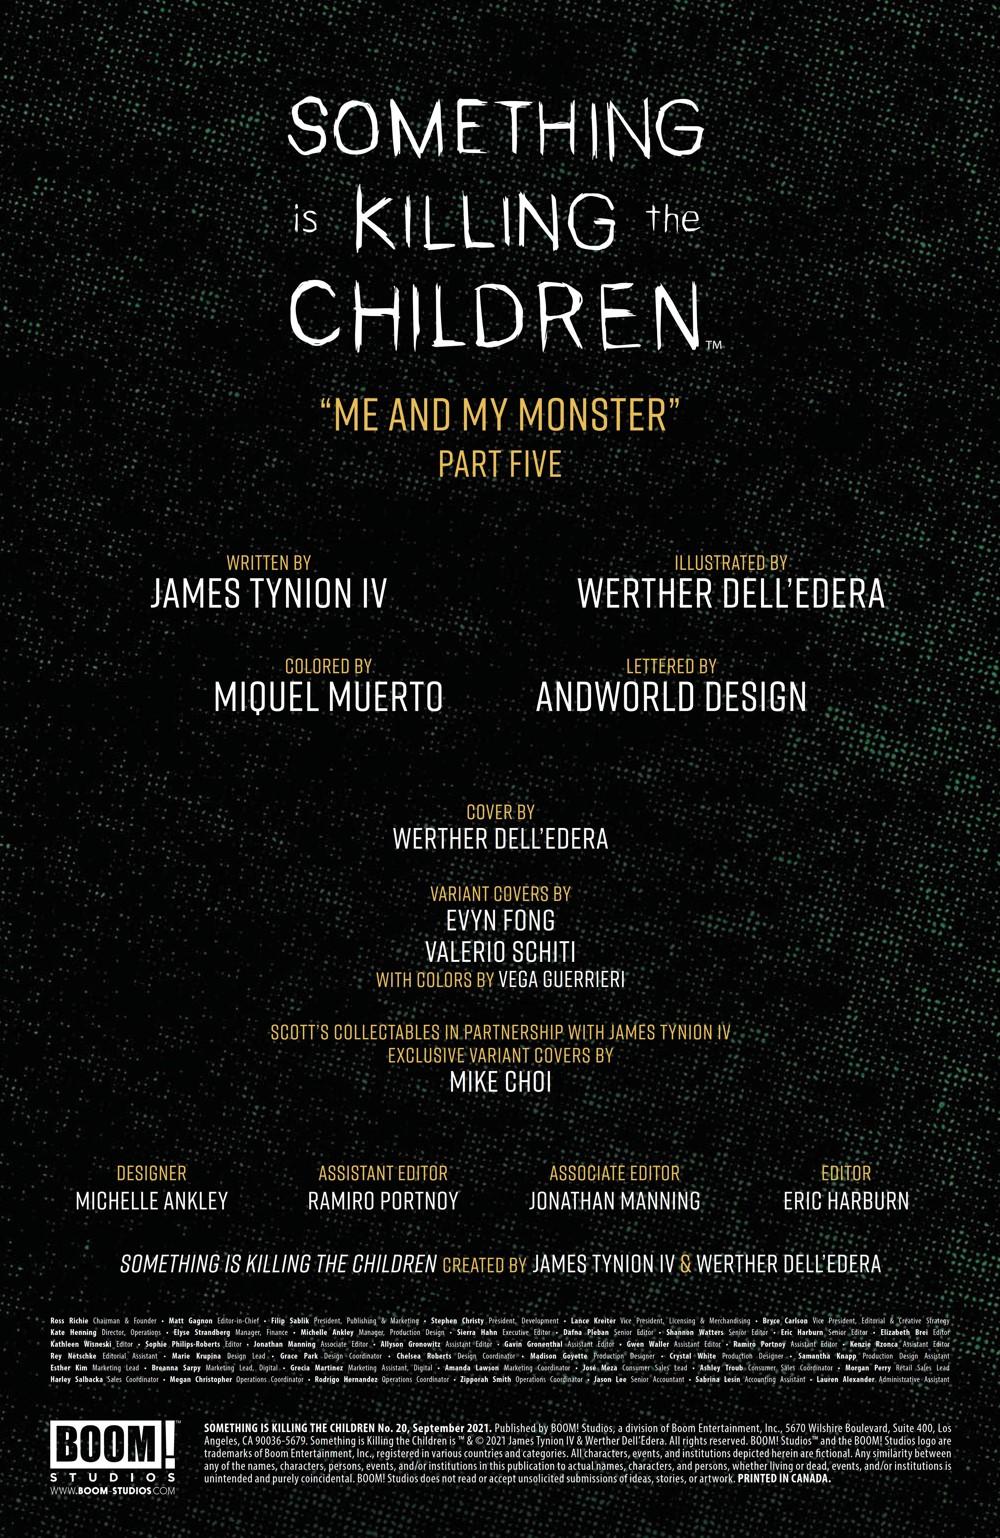 SomethingKillingChildren_020_PRESS_29 ComicList Previews: SOMETHING IS KILLING THE CHILDREN #20